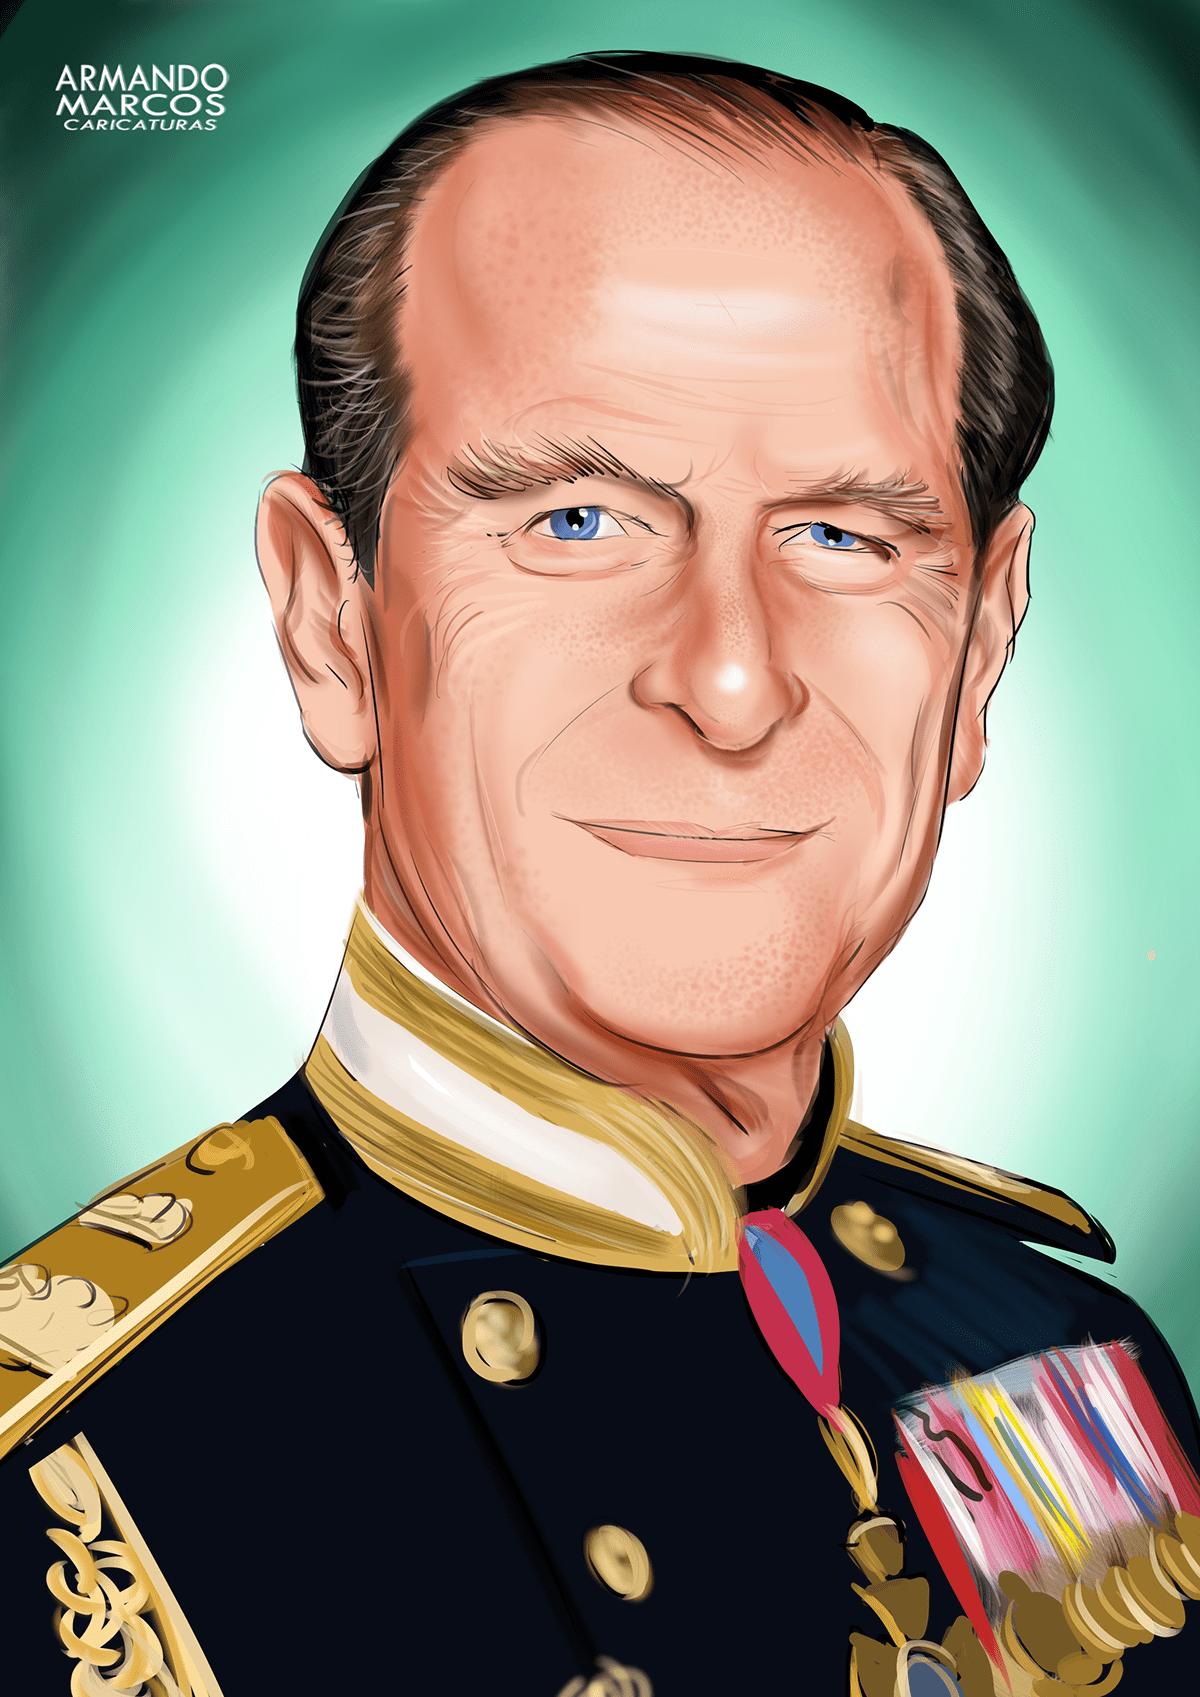 Adobe Portfolio #desenhodigital Caricatura Realista prince philip Digital Art  ilustration